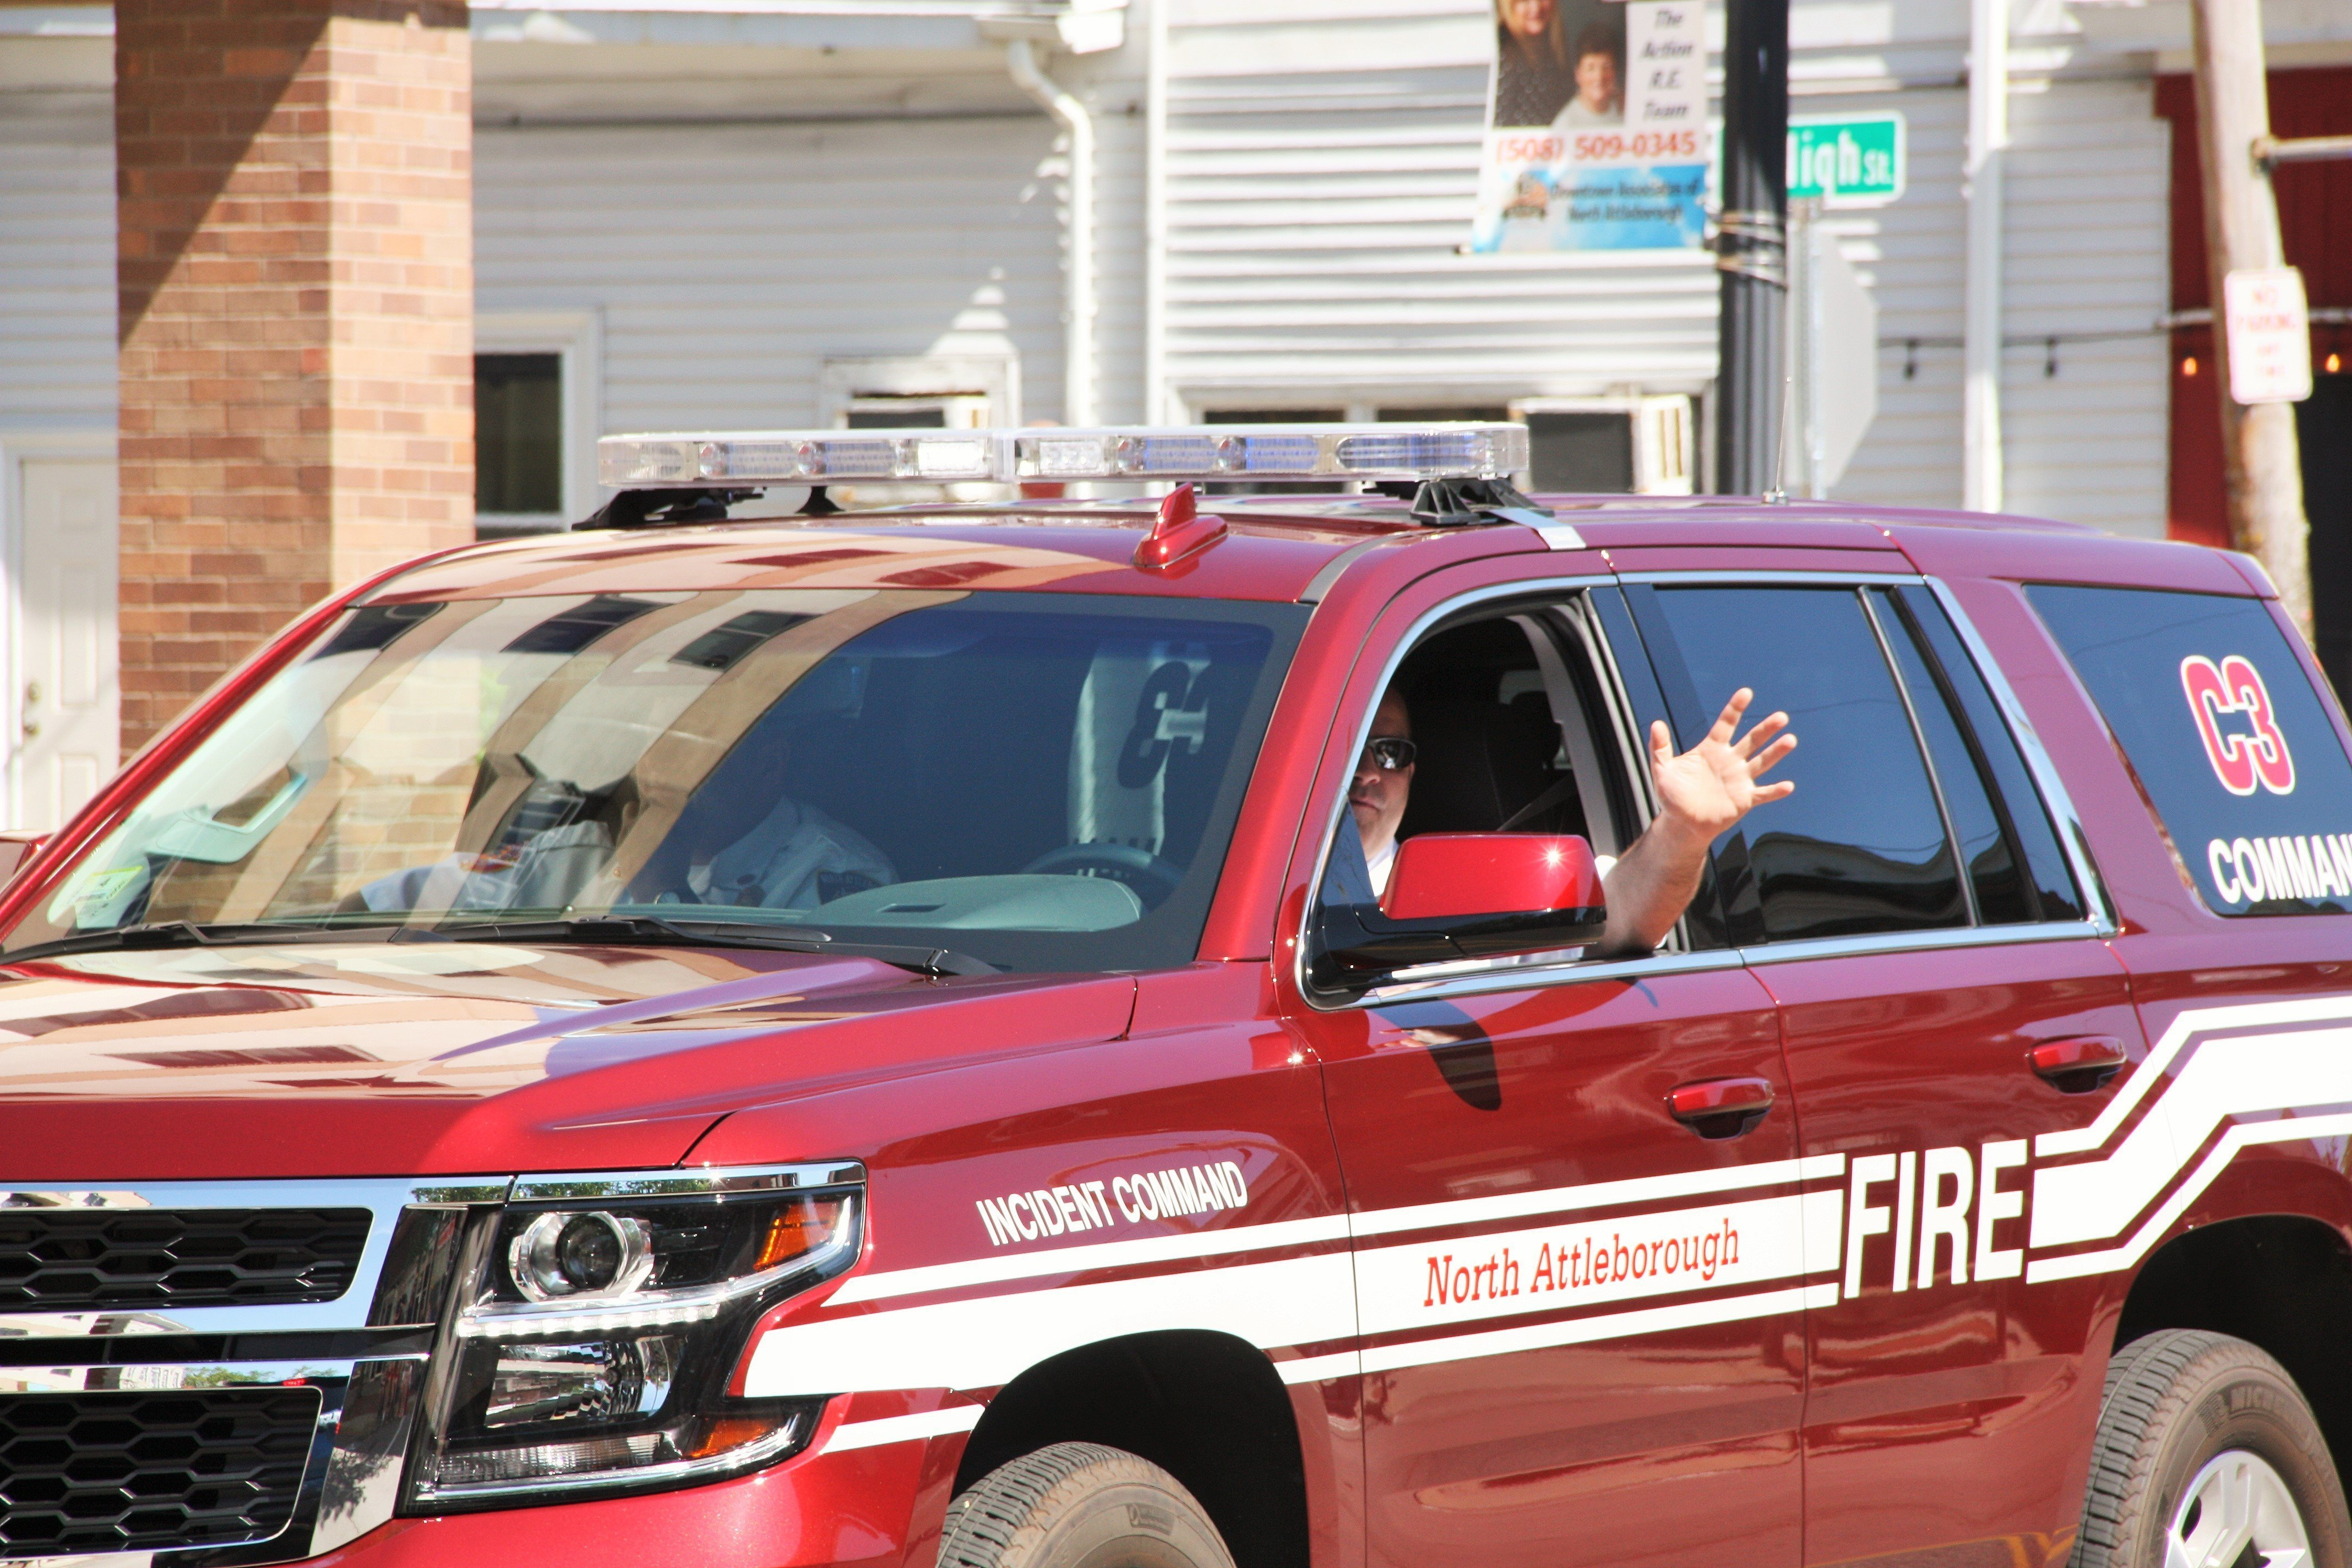 North Attleborough Fire Department